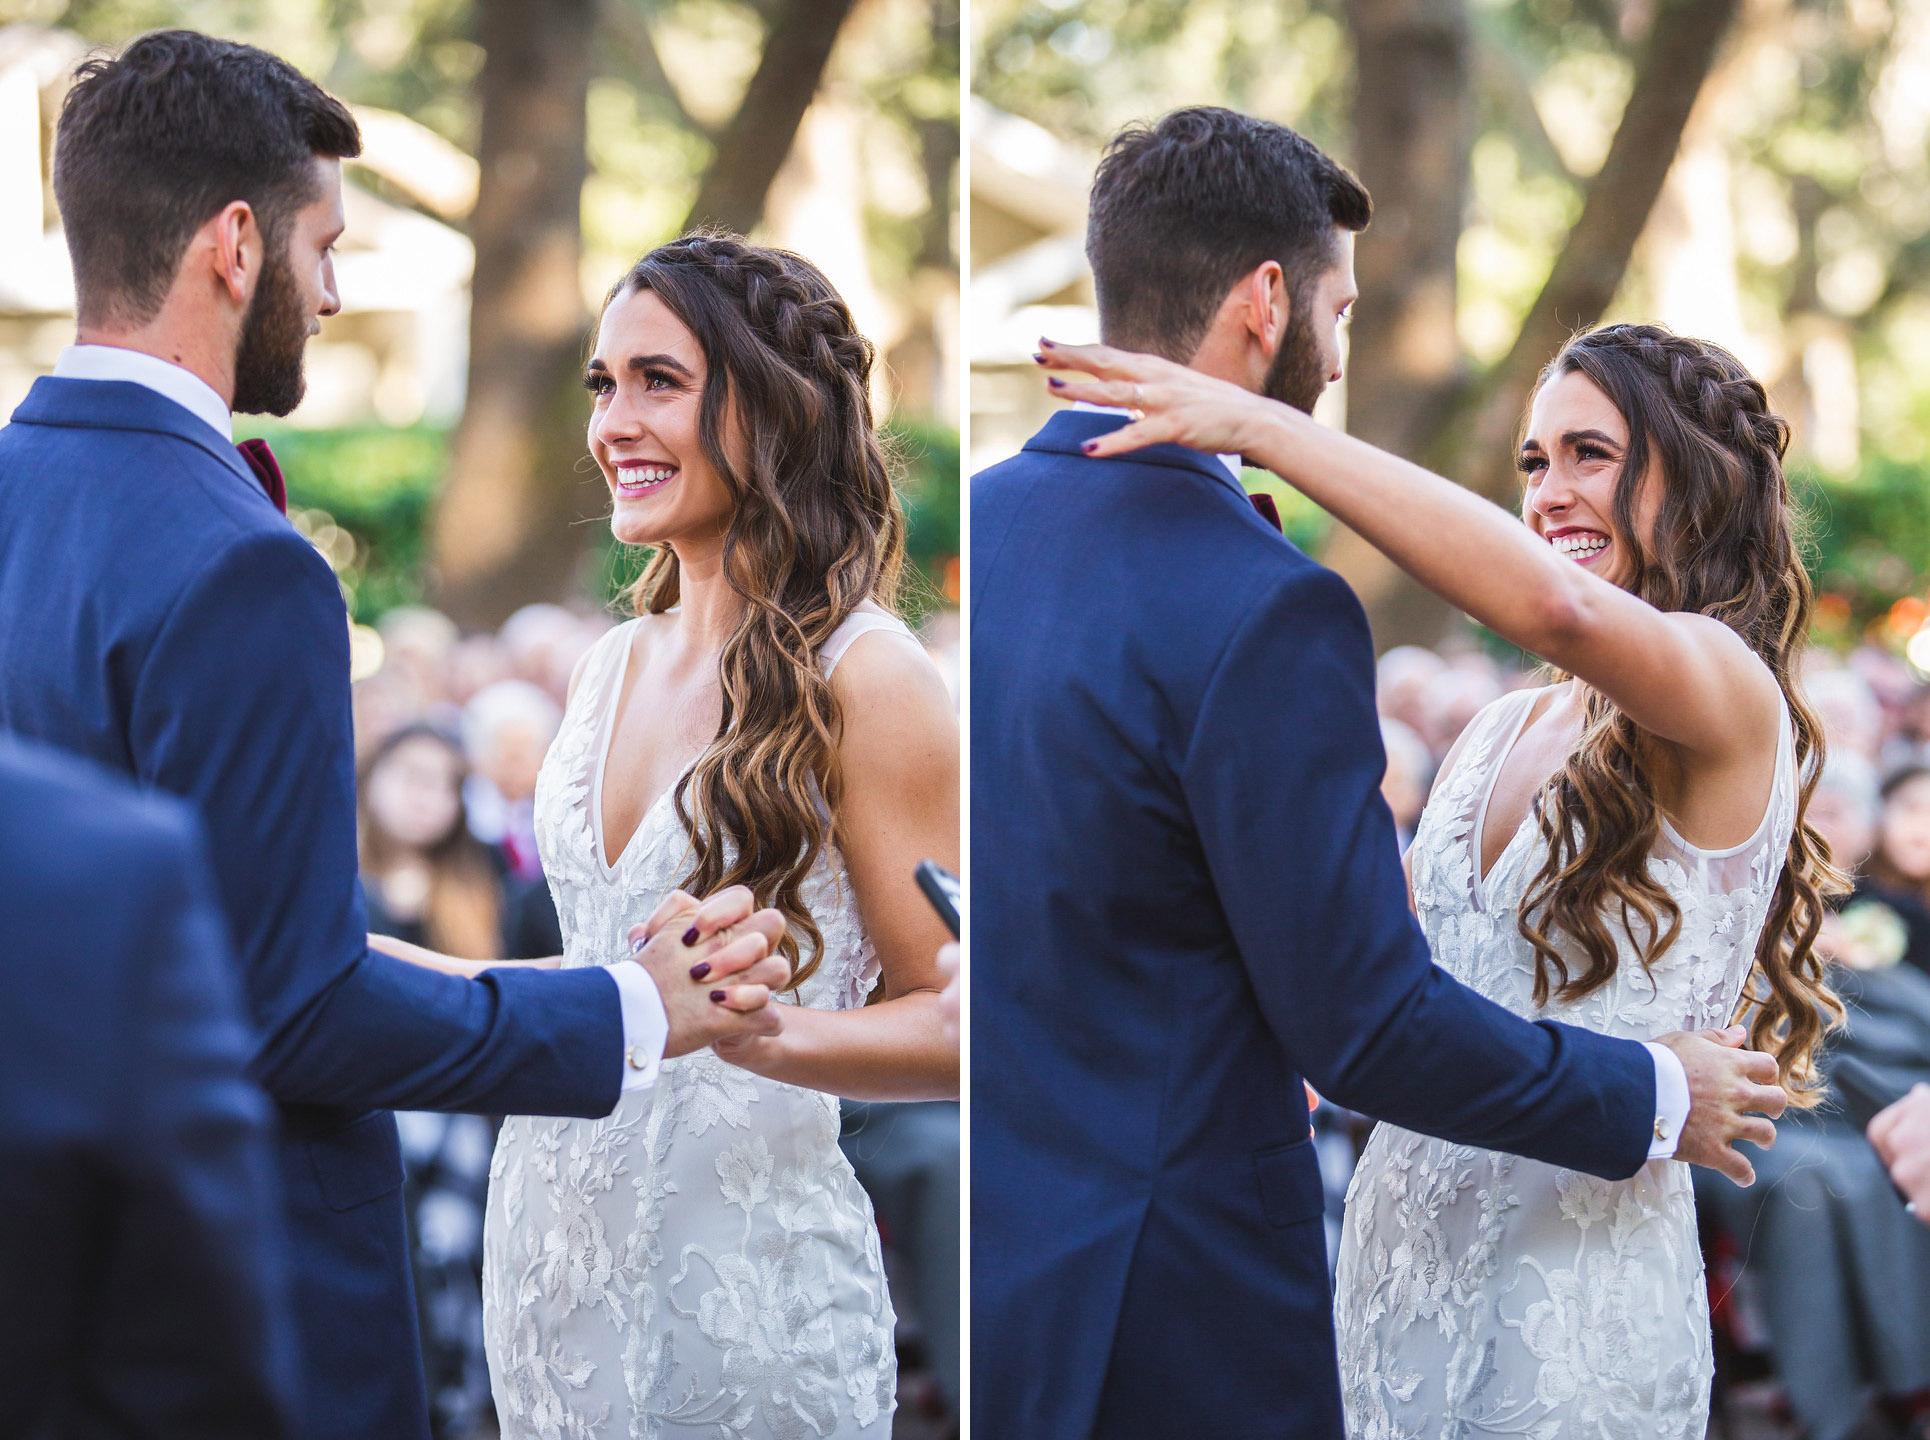 adam-szarmack-bowing-oaks-wedding-photographer-jacksonville-83.jpg